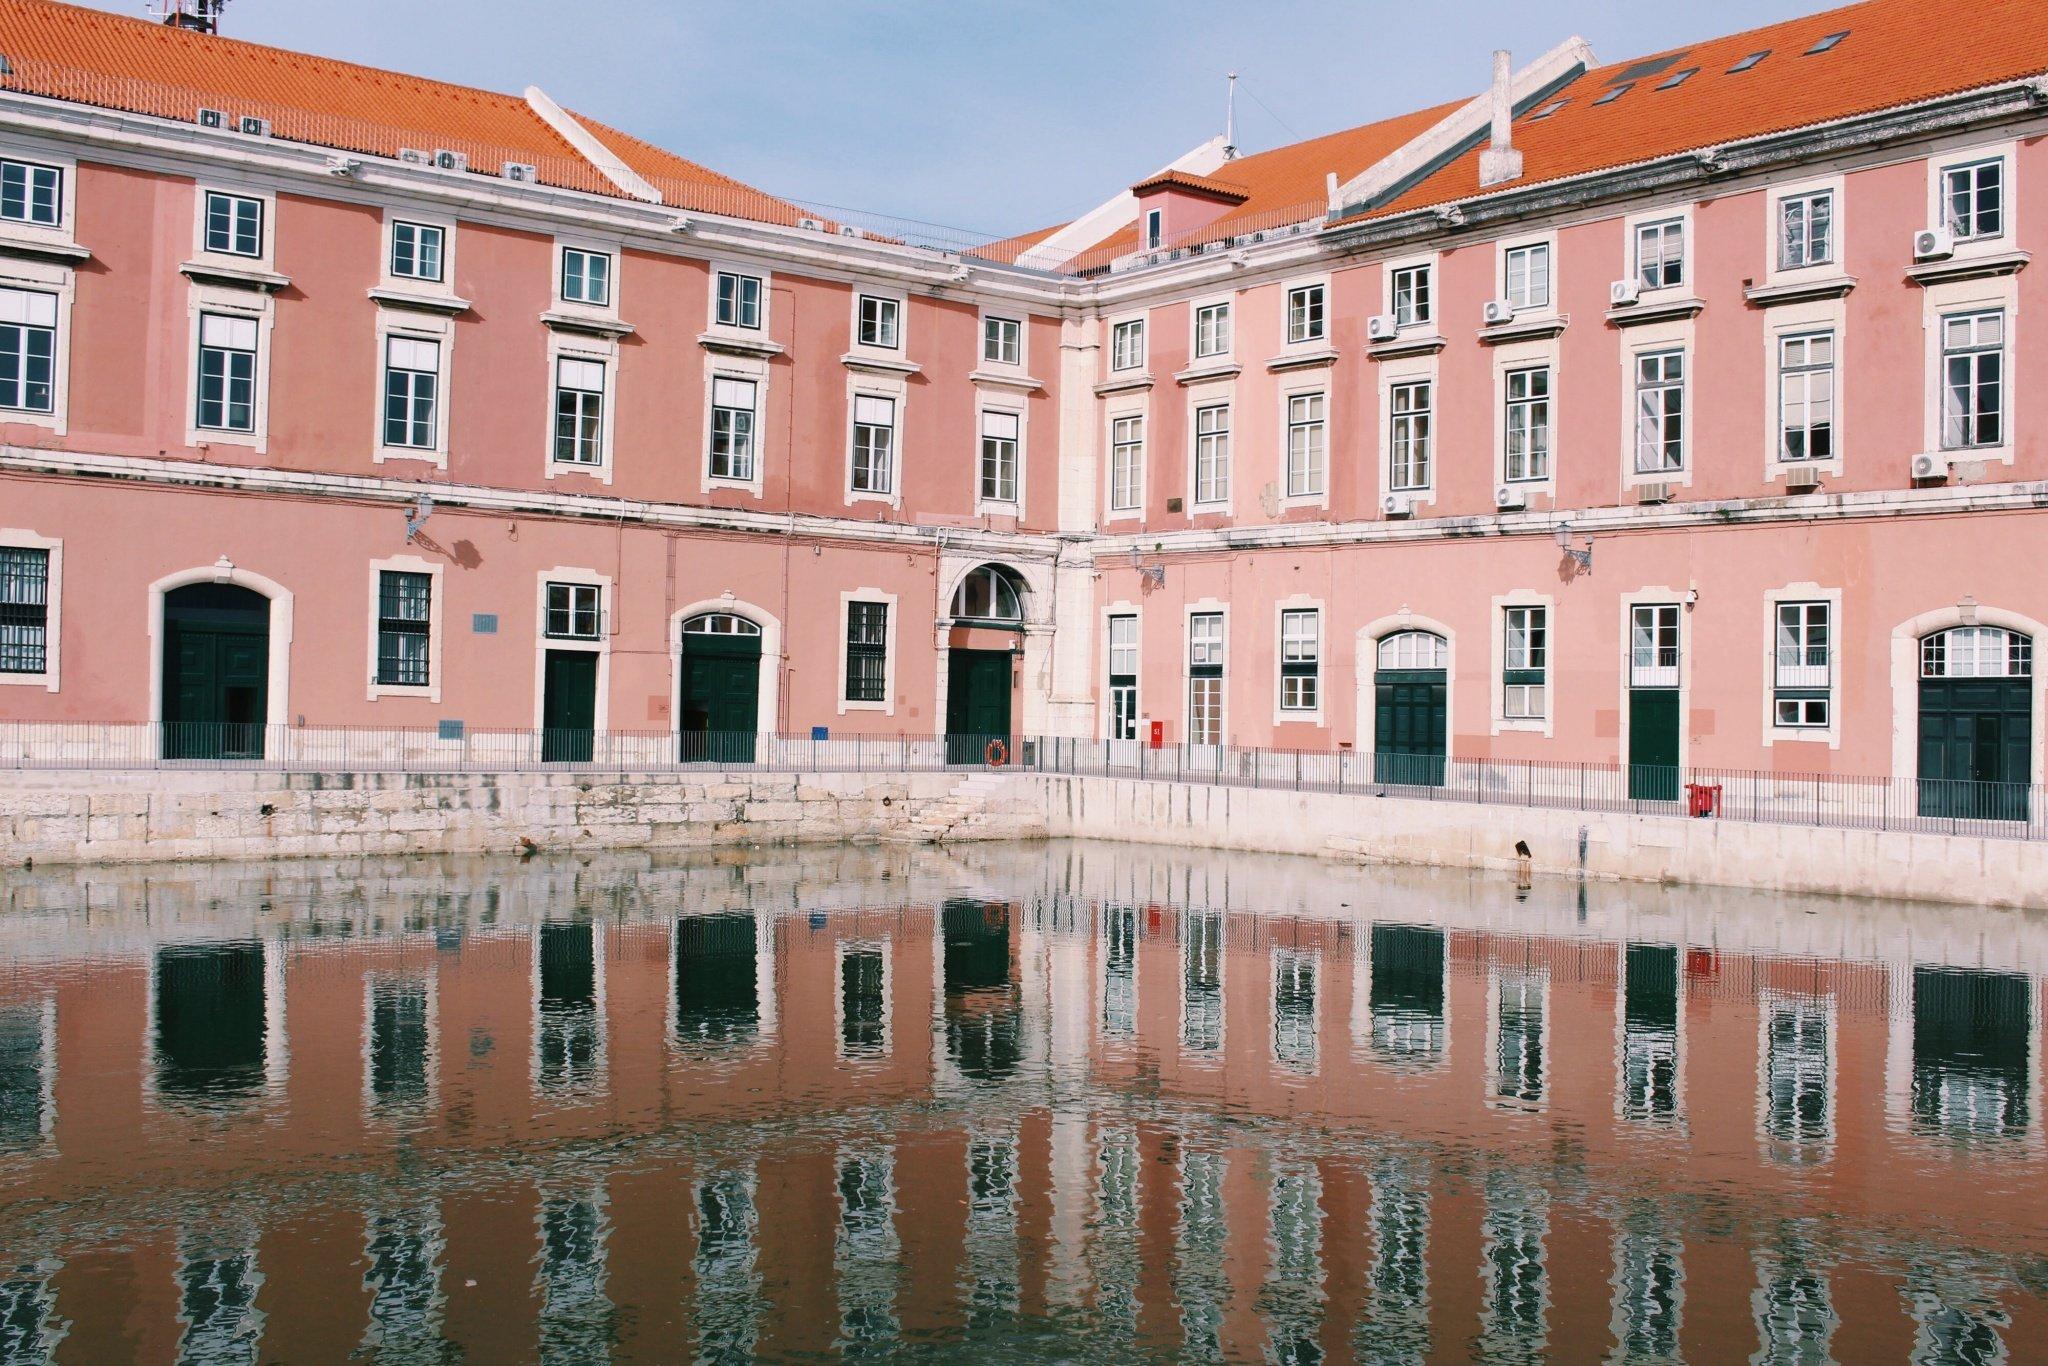 Building water reflection near Plaza do Comercio in Lisbon, Portugal